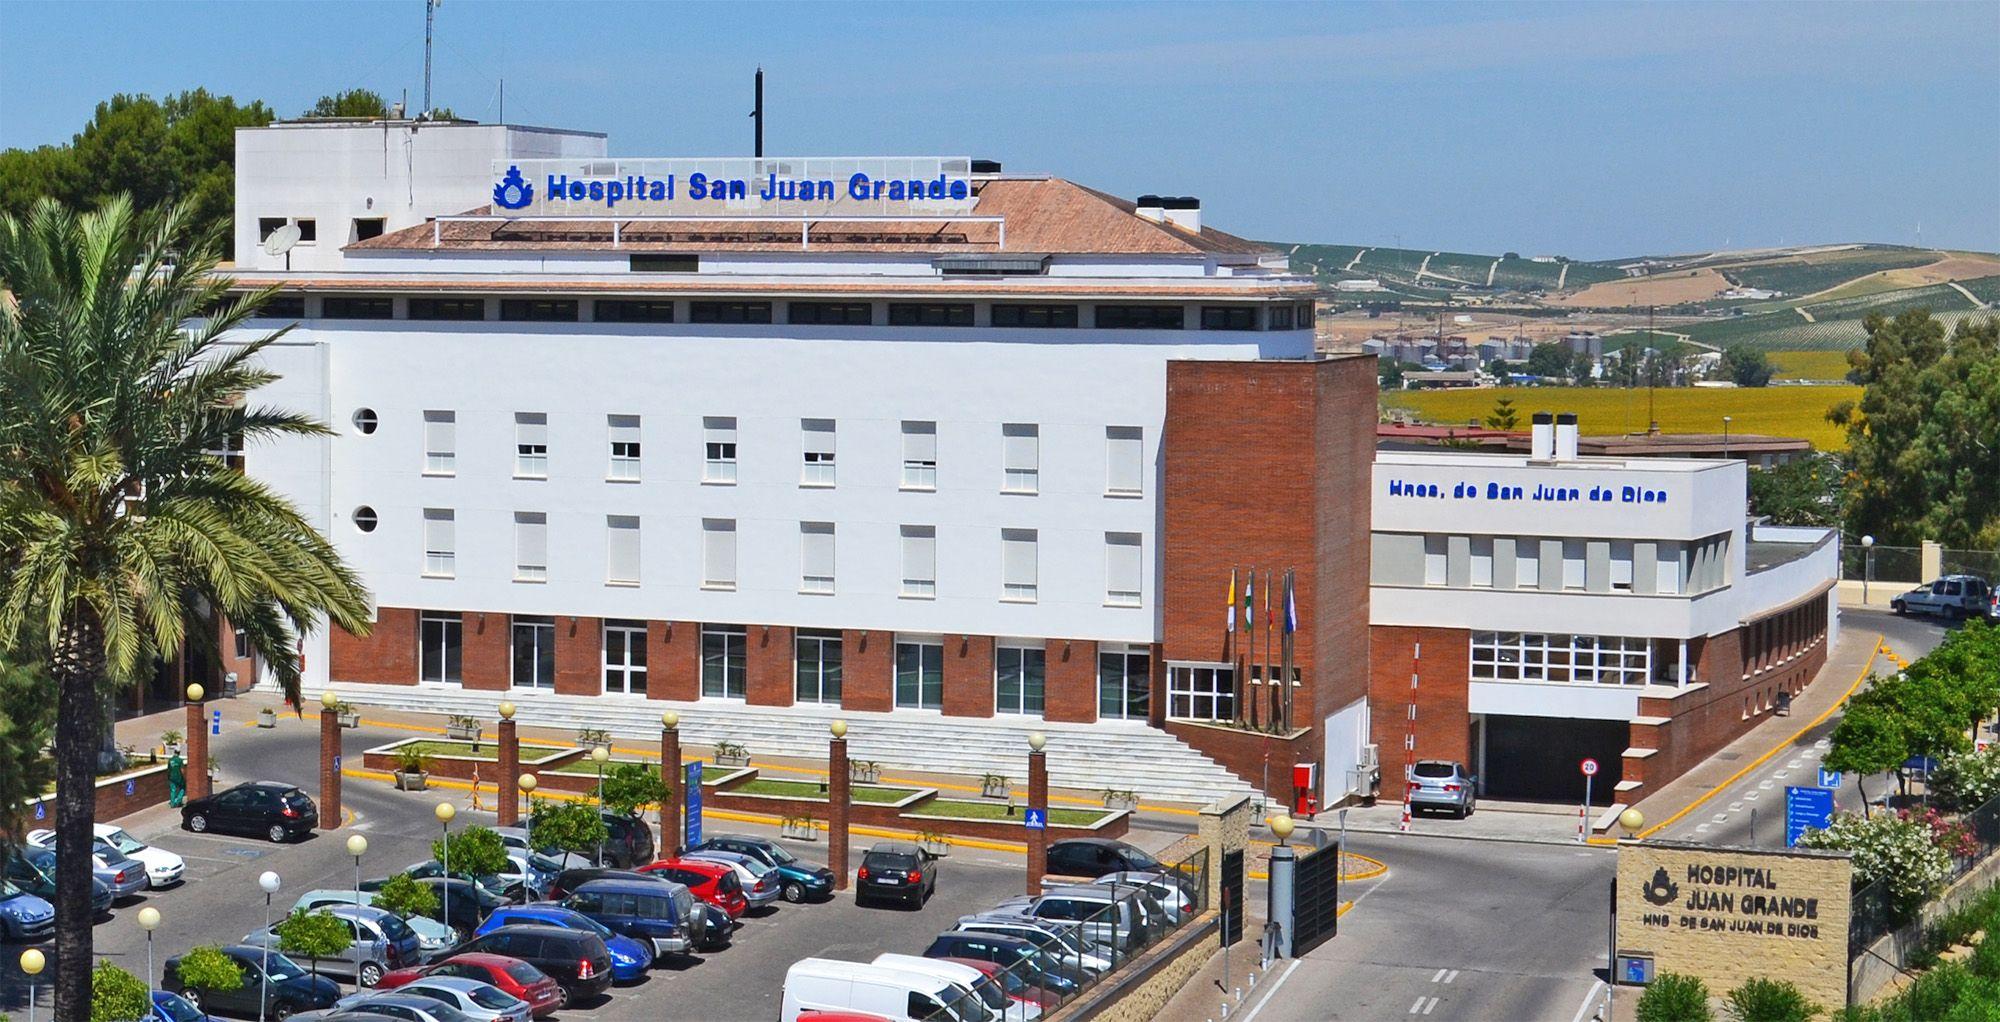 hospital-san-juan-grande